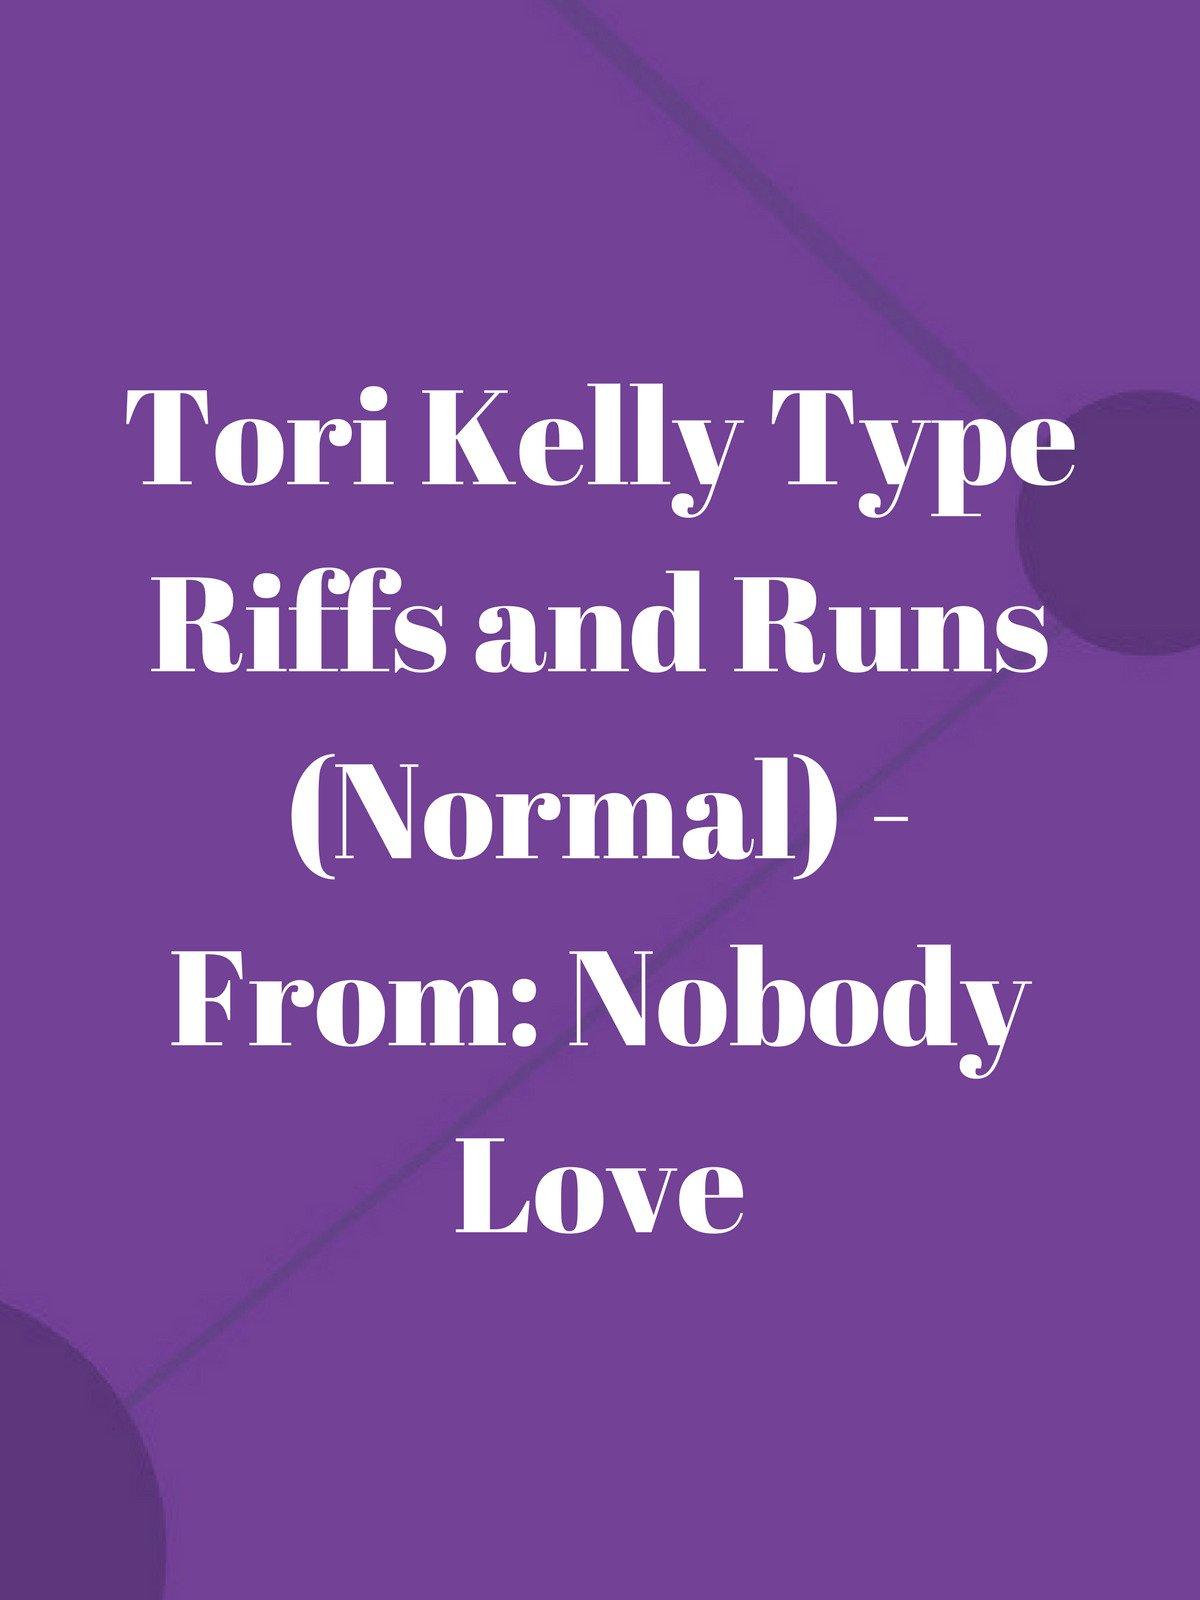 Tori Kelly Type Riffs and Runs (Normal)